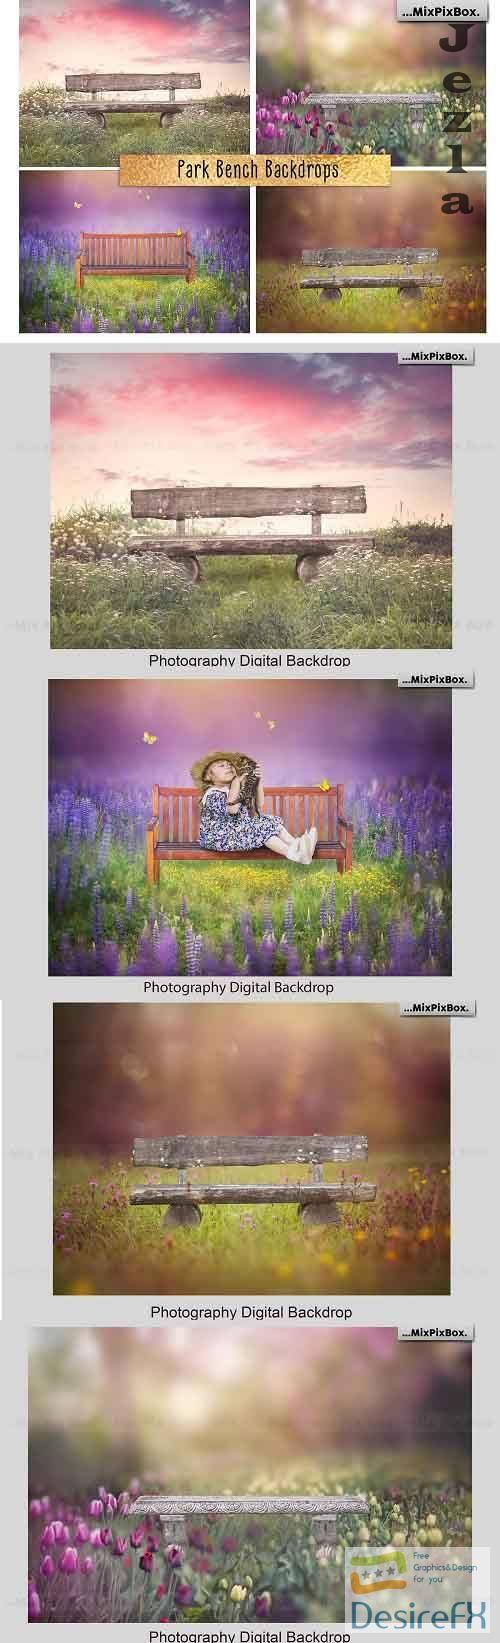 Park Bench Backdrops - 5013302